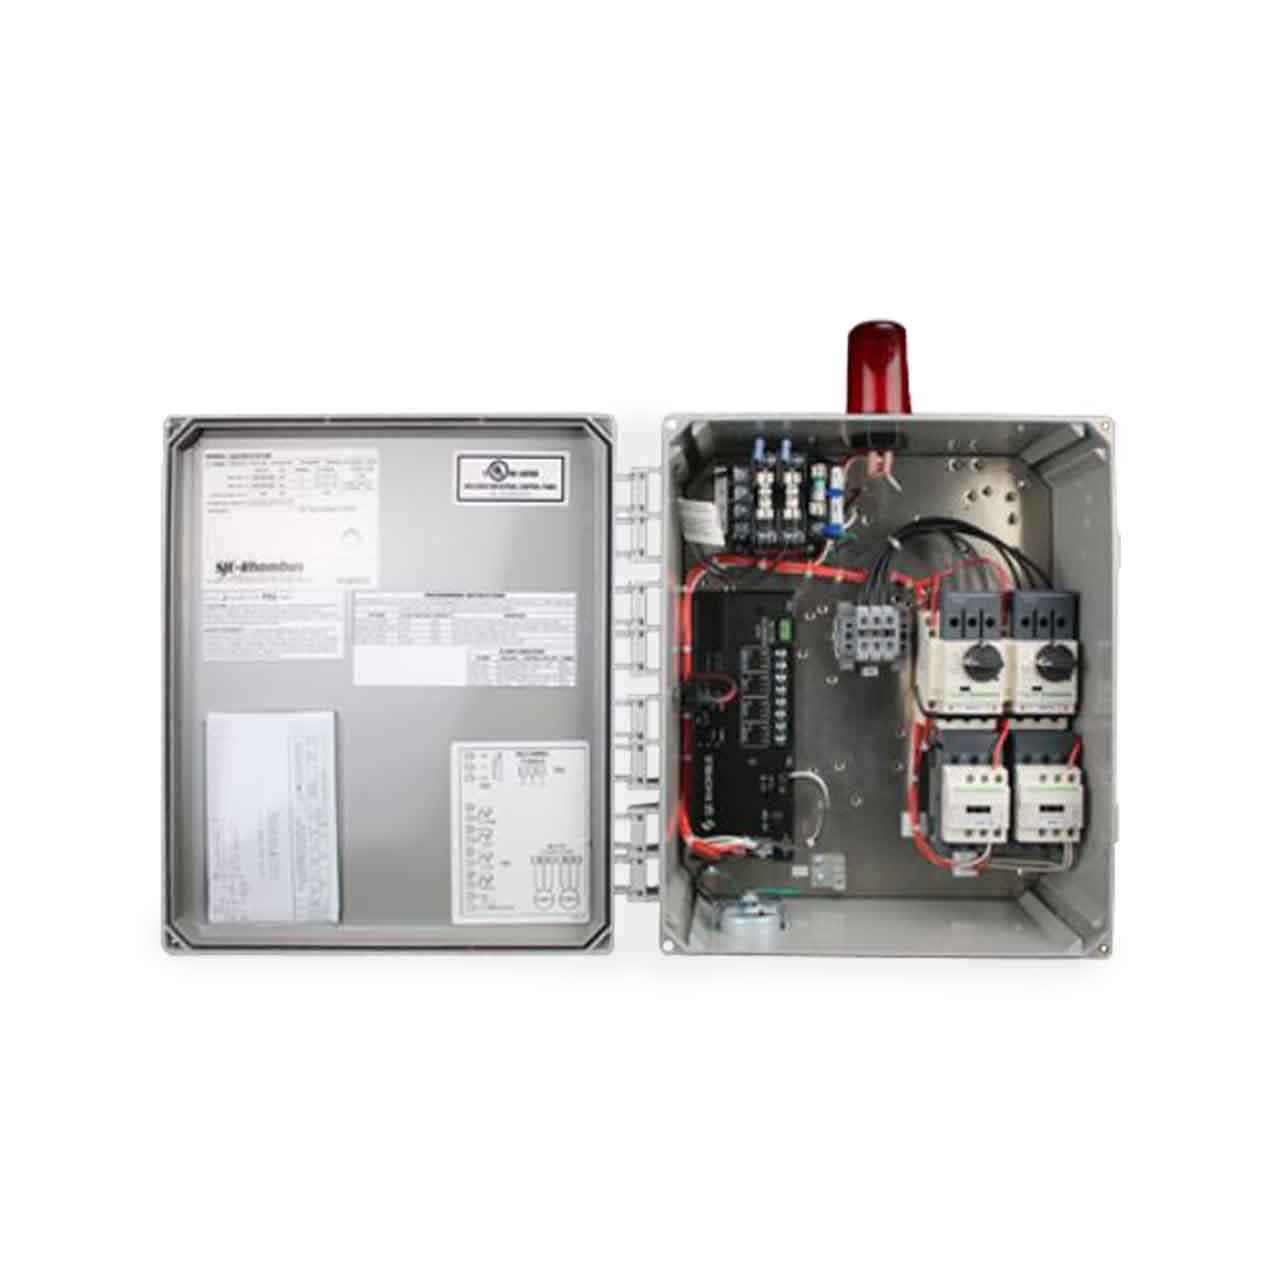 medium resolution of sje rhombus sje rhombus model 322 3 phase 208 240 480 600v duplex sump pump float switch diagram sje float switch wiring diagram